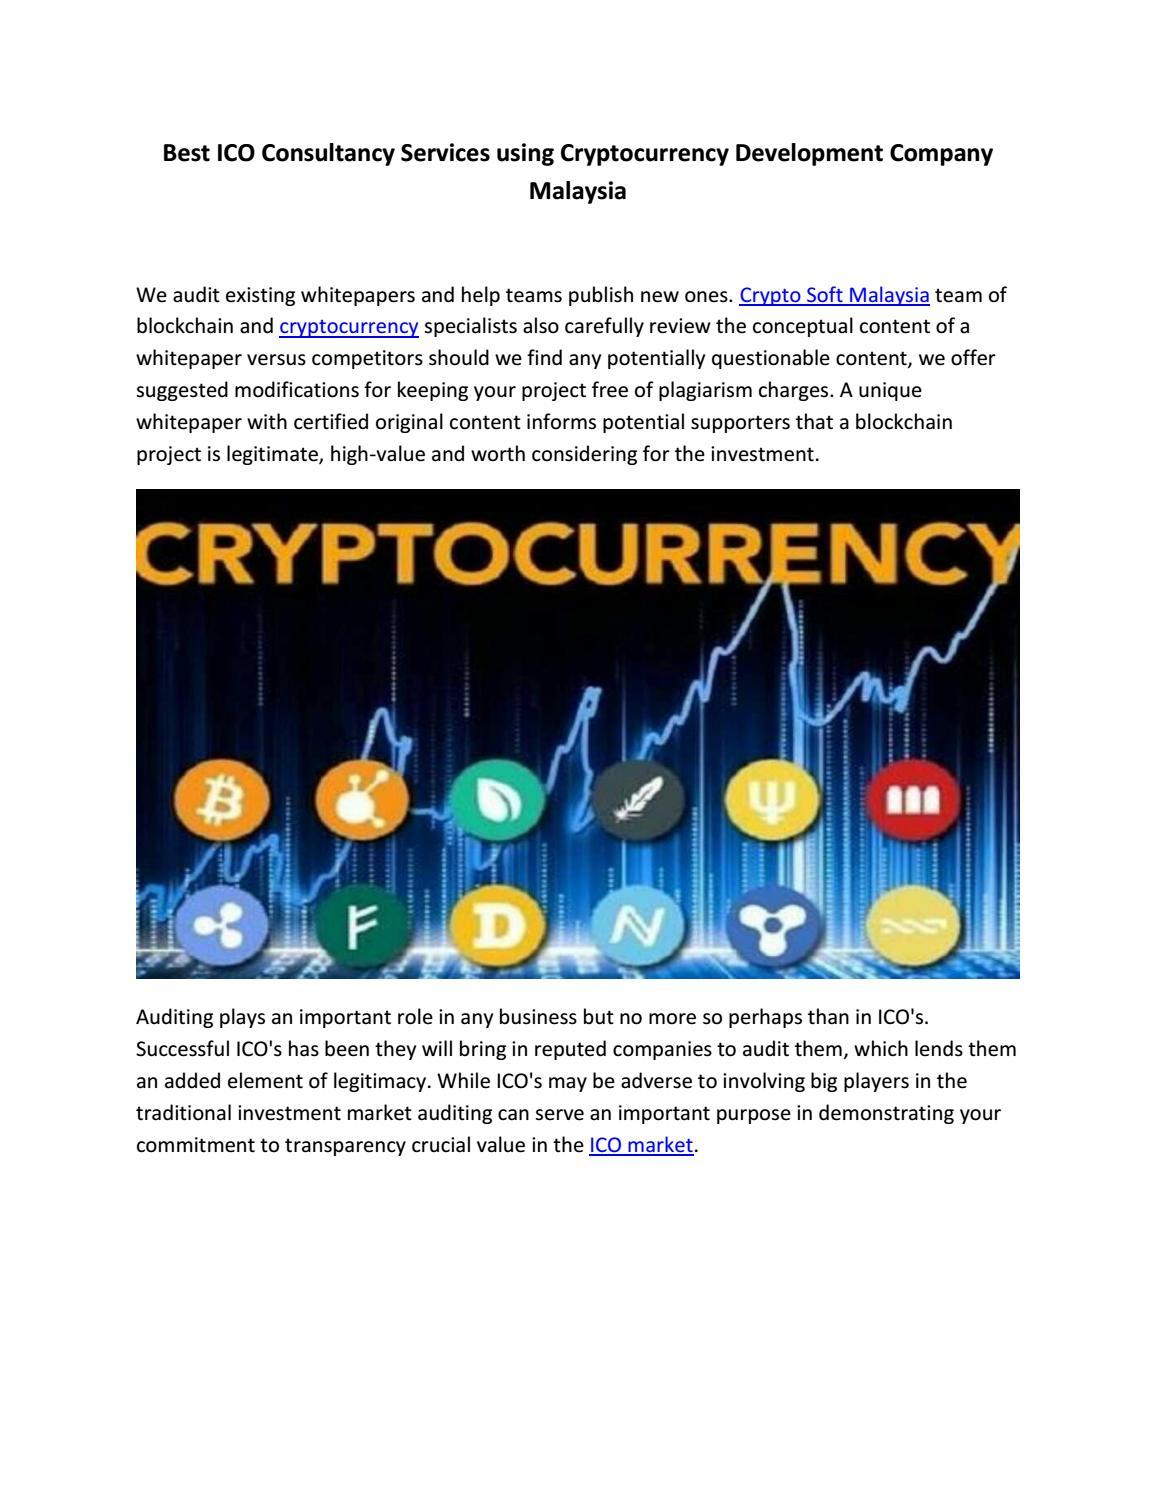 bitcoin investment malaysia